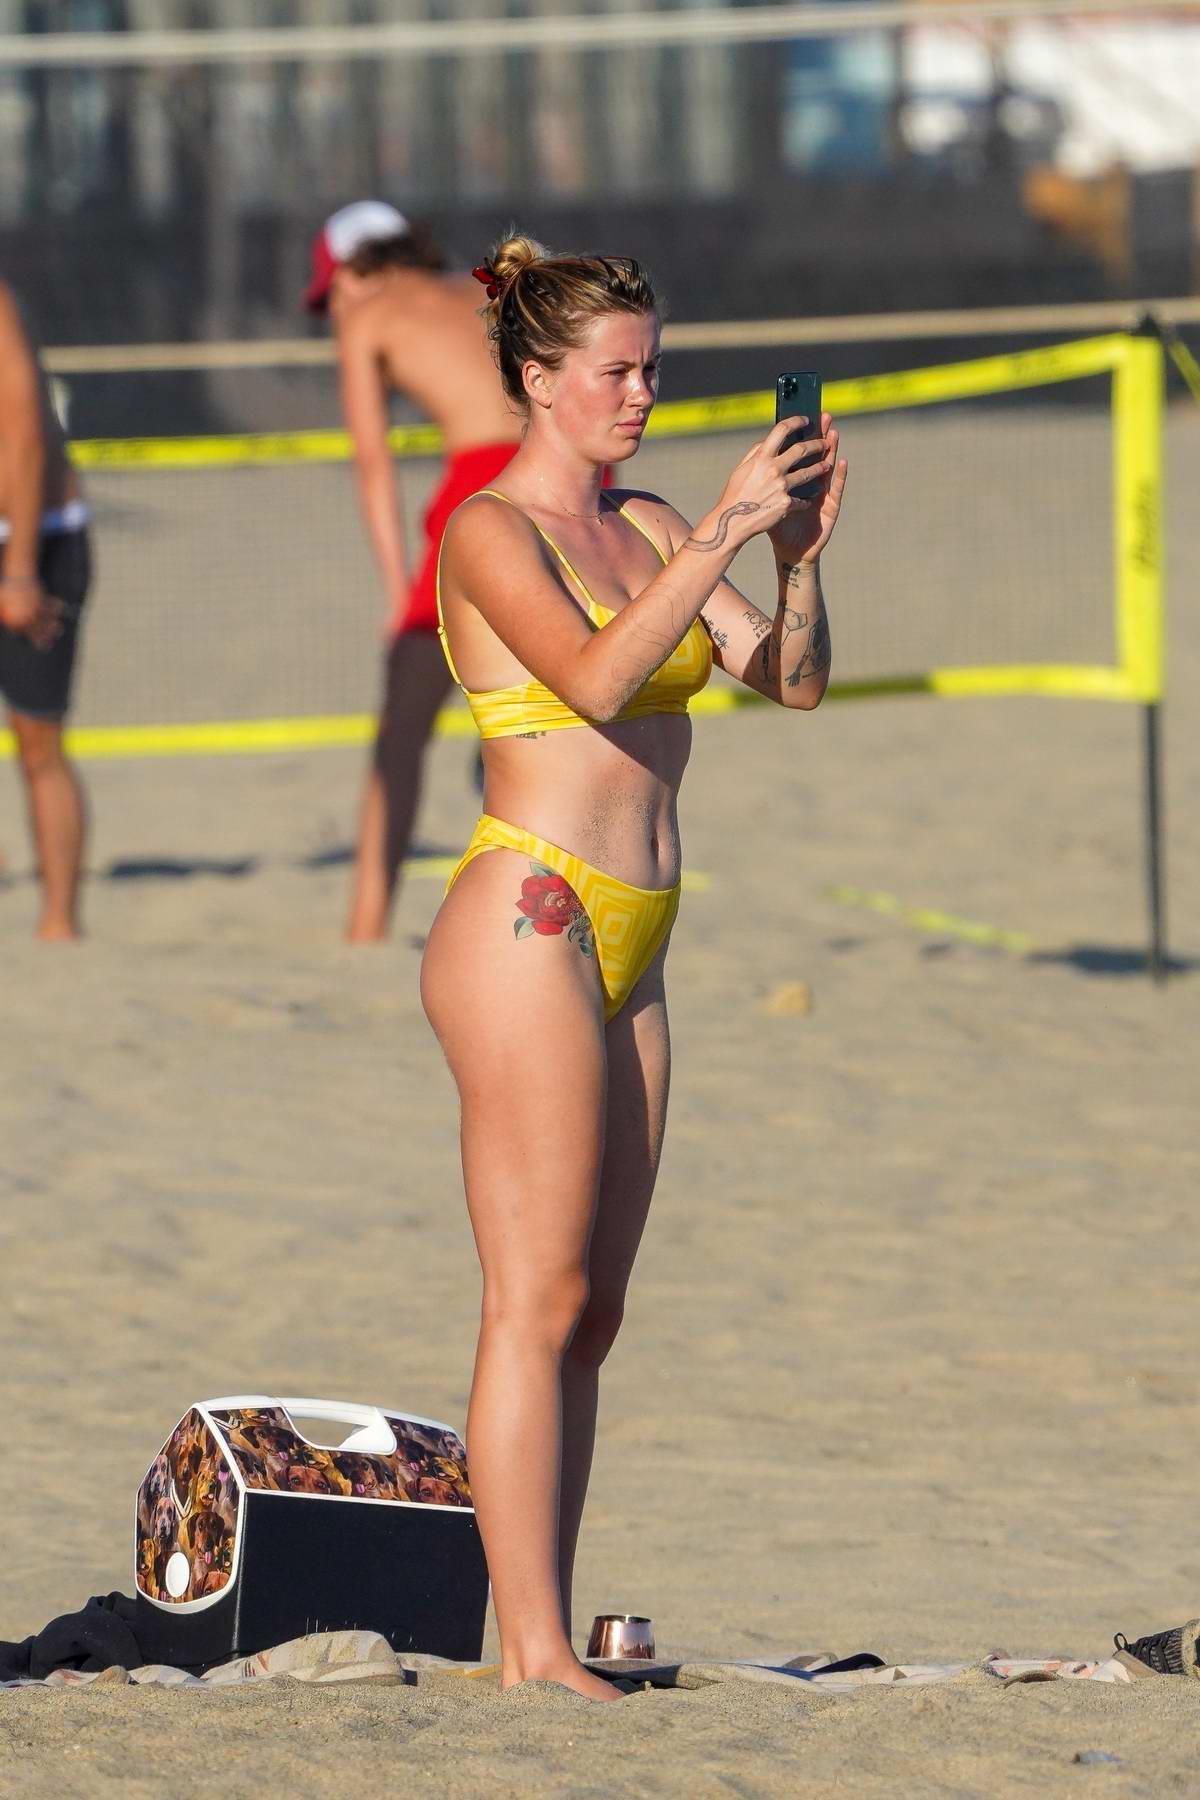 Ireland Baldwin looks striking in a yellow bikini while at the beach with boyfriend Corey Harper in Malibu, California